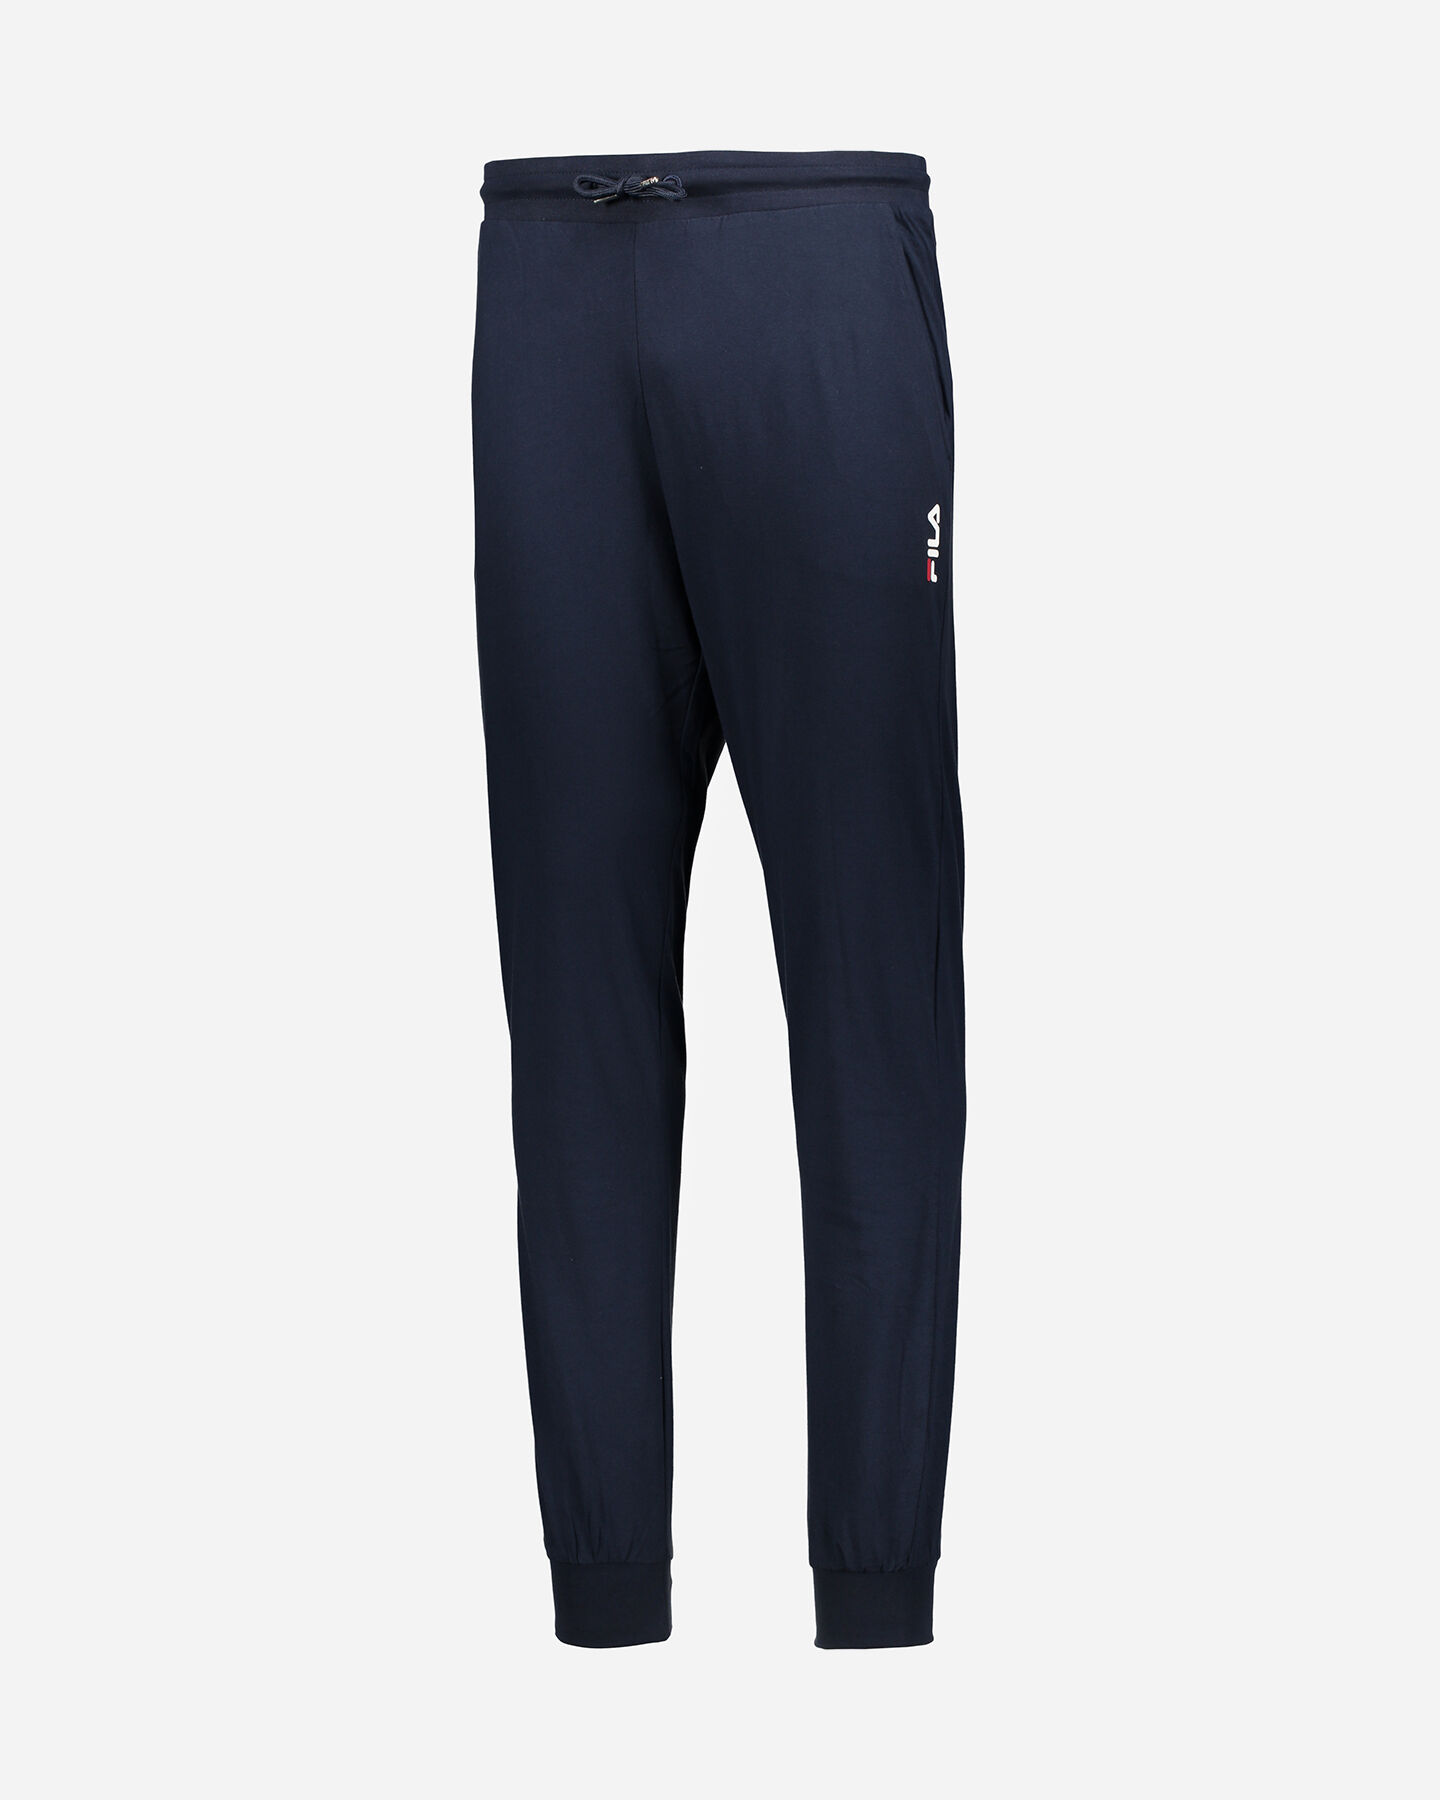 Pantalone FILA CUFF SPORT PANTS M S4034297 scatto 4